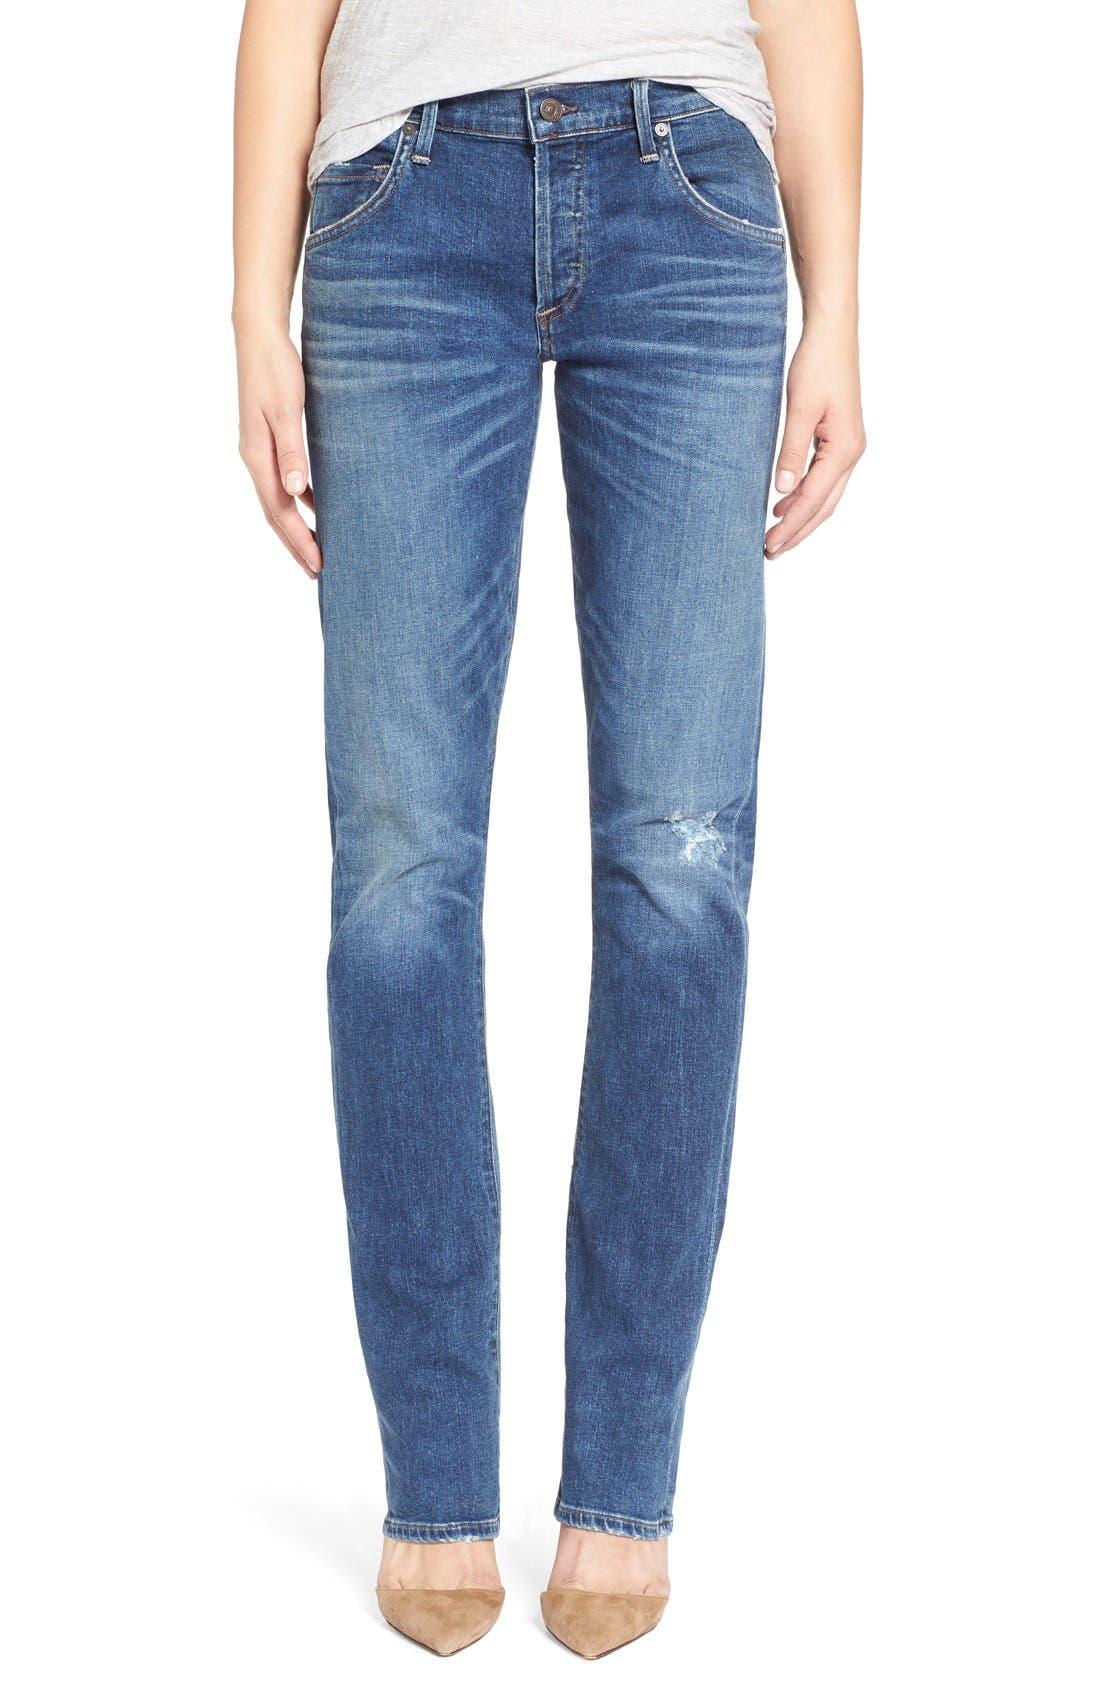 'Emerson Long' Slim Boyfriend Jeans,                             Main thumbnail 1, color,                             Blue Mountain